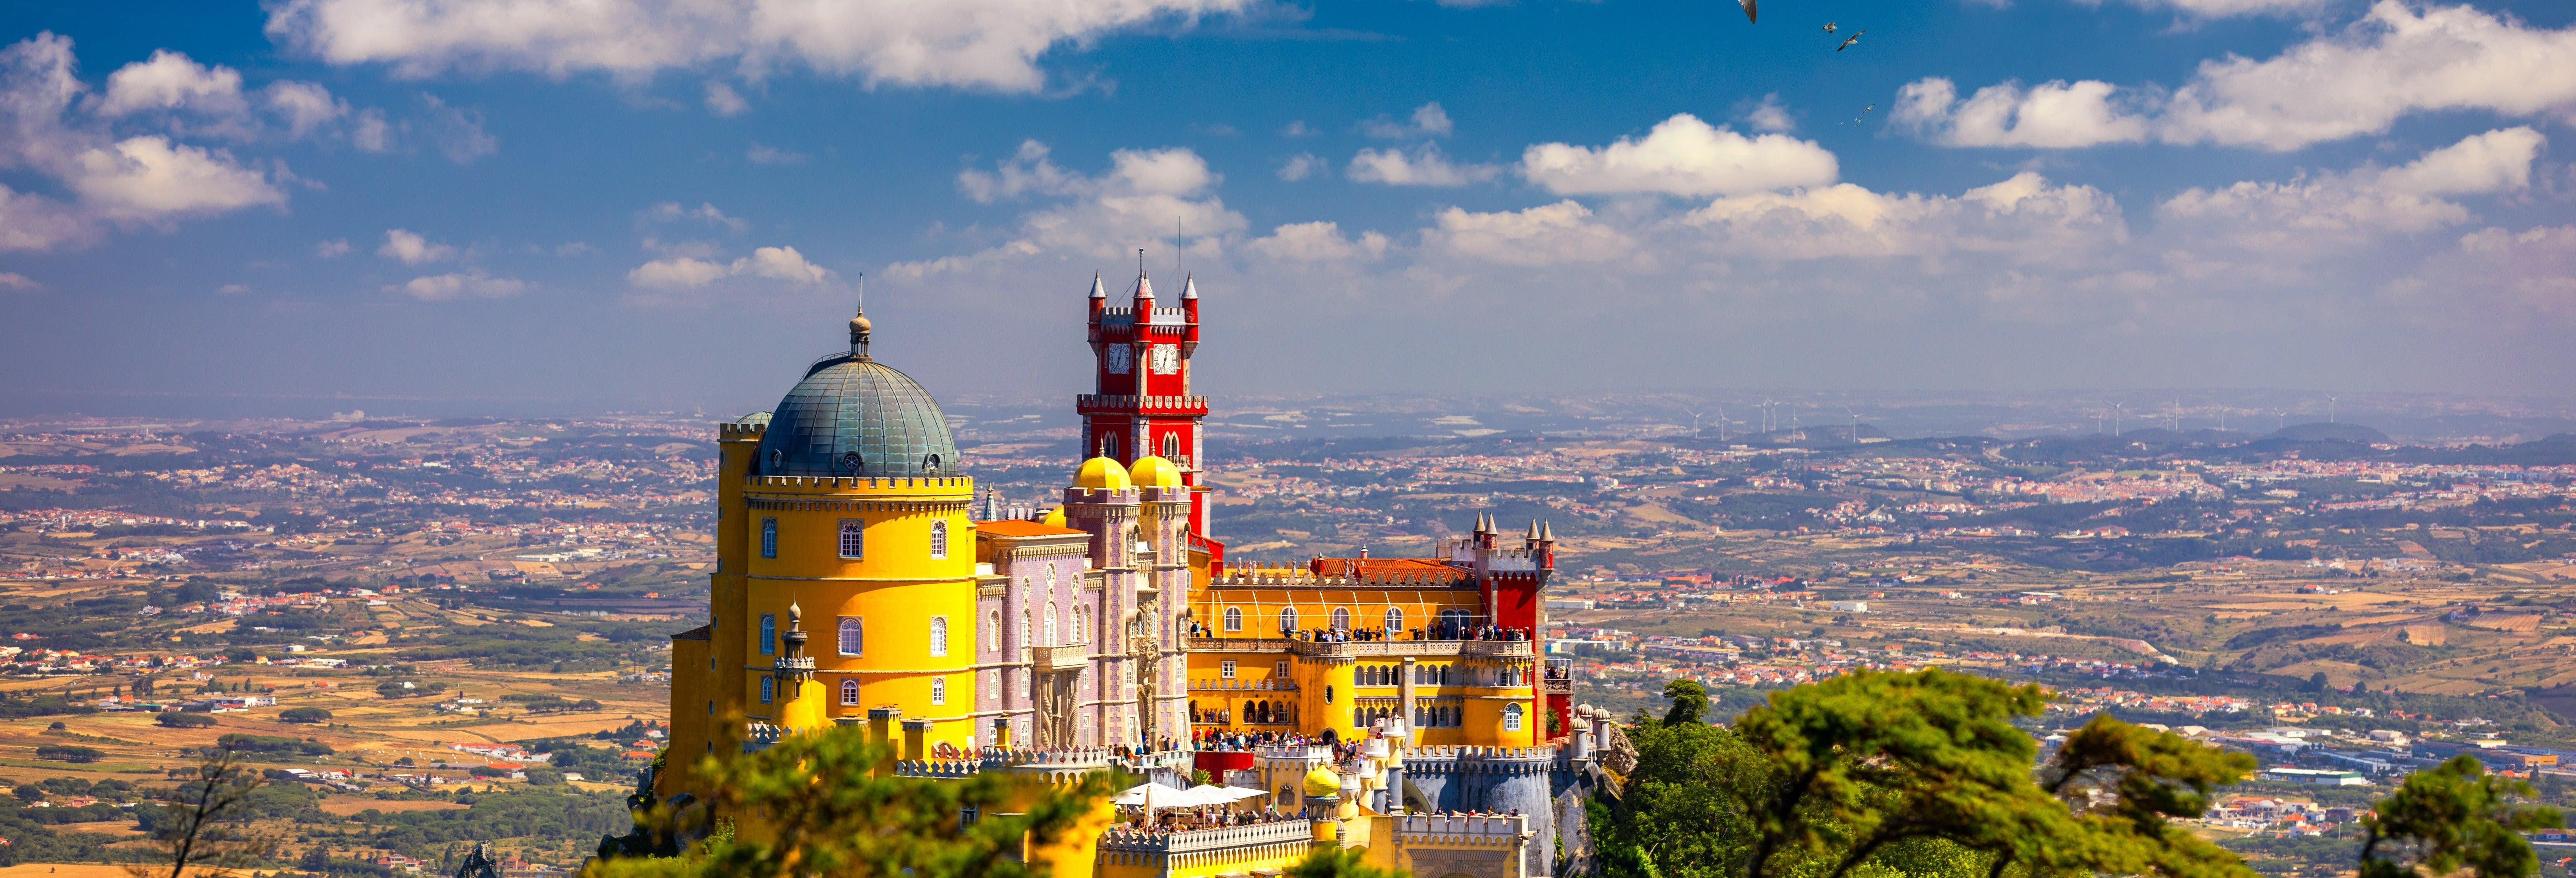 Free Tour of Sintra